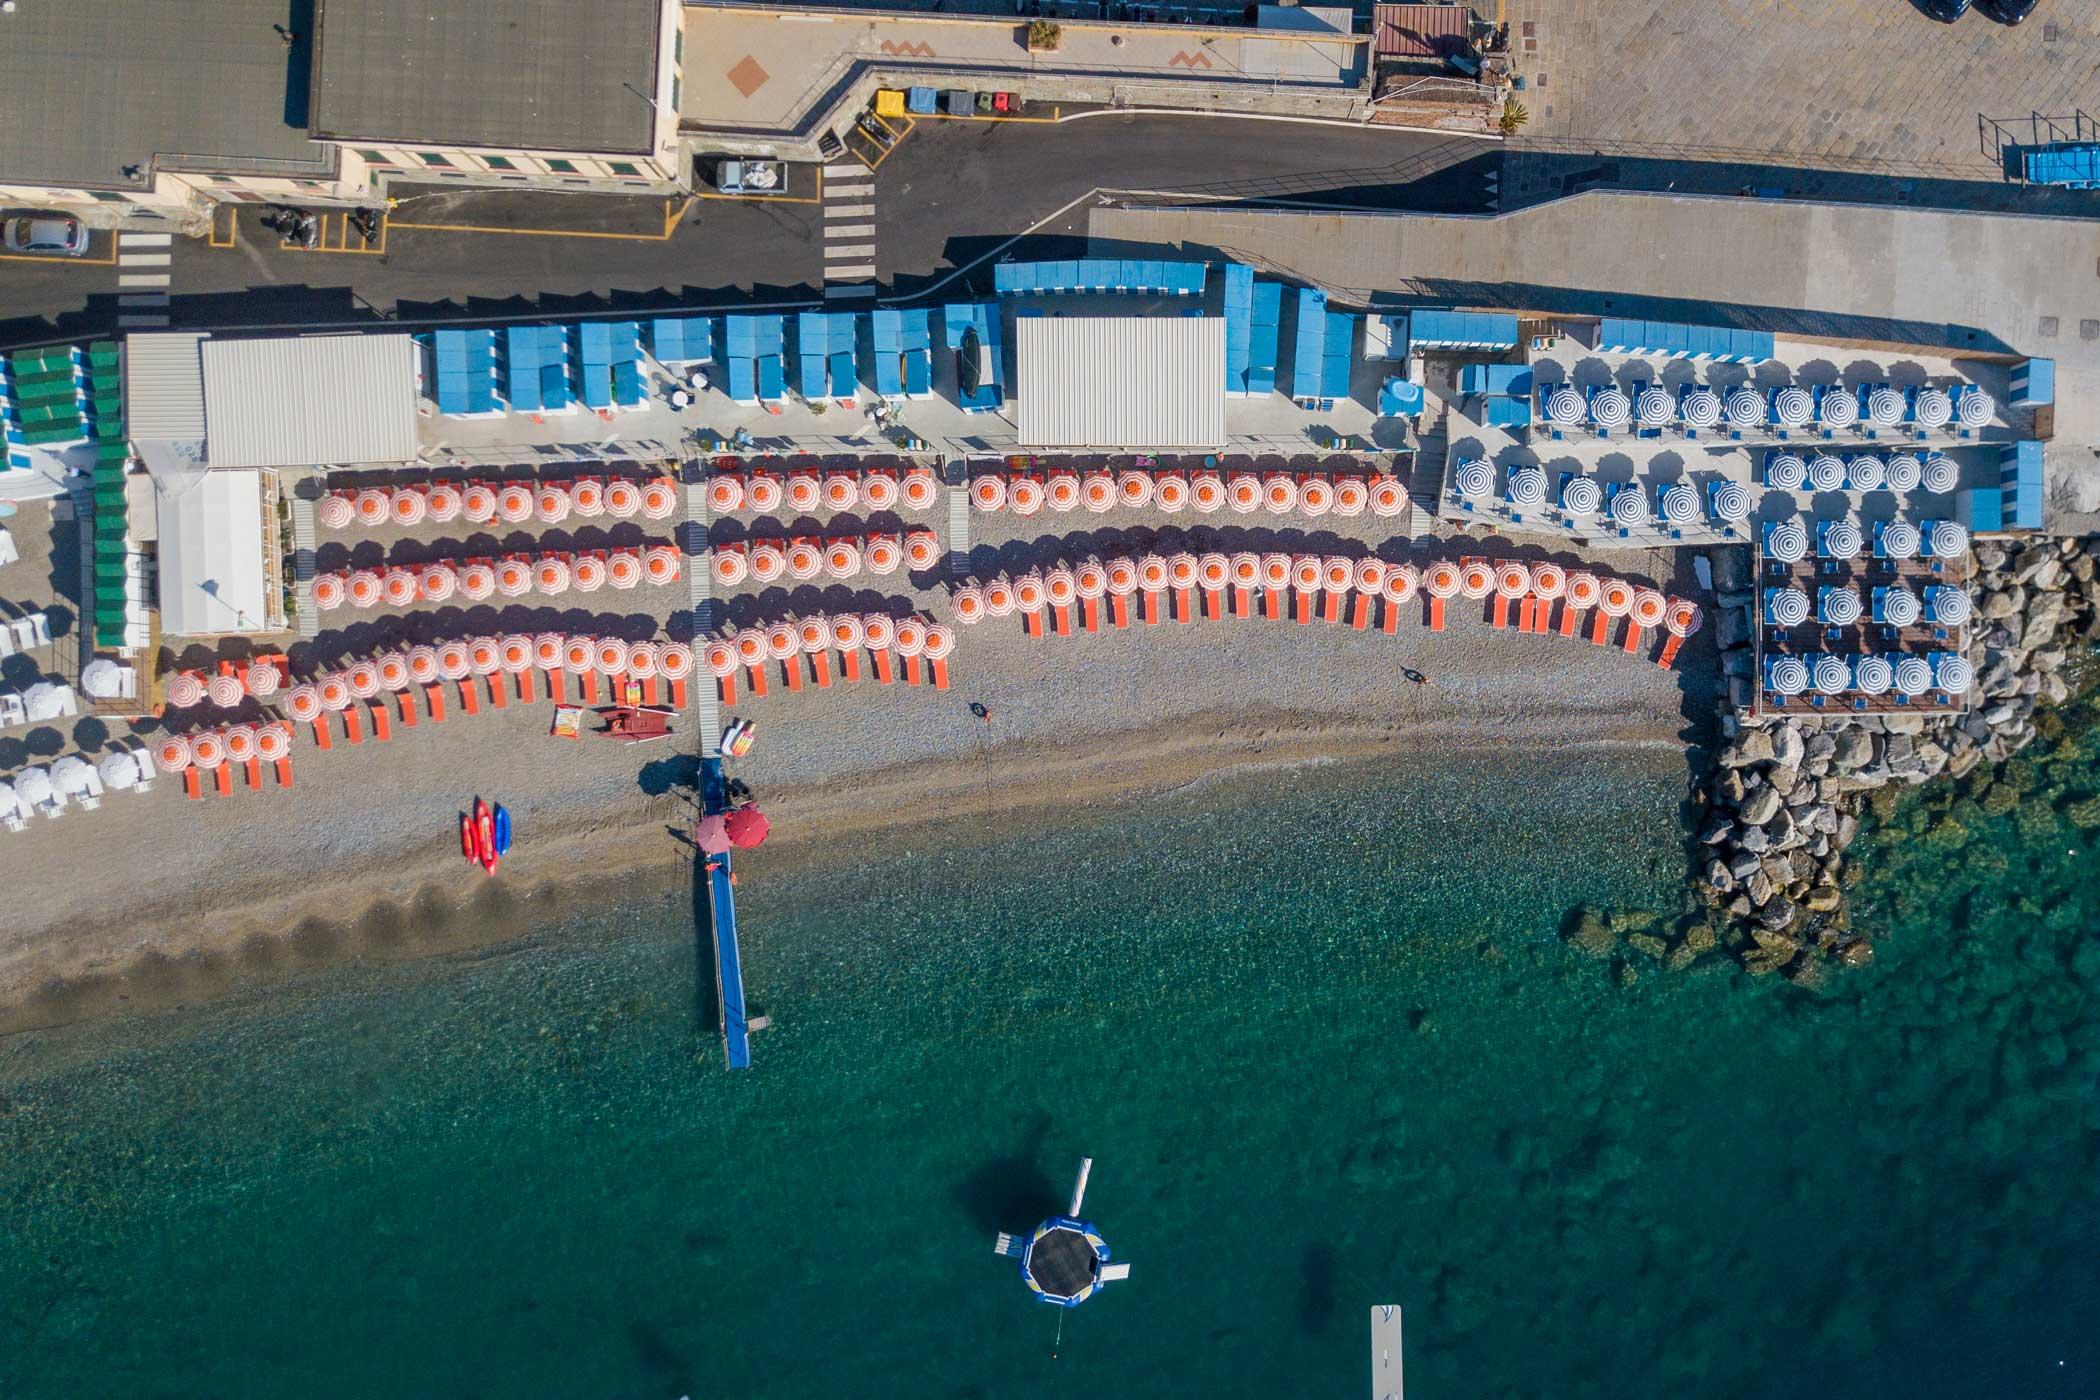 Bagni Sirena 2019 - ripresa aerea